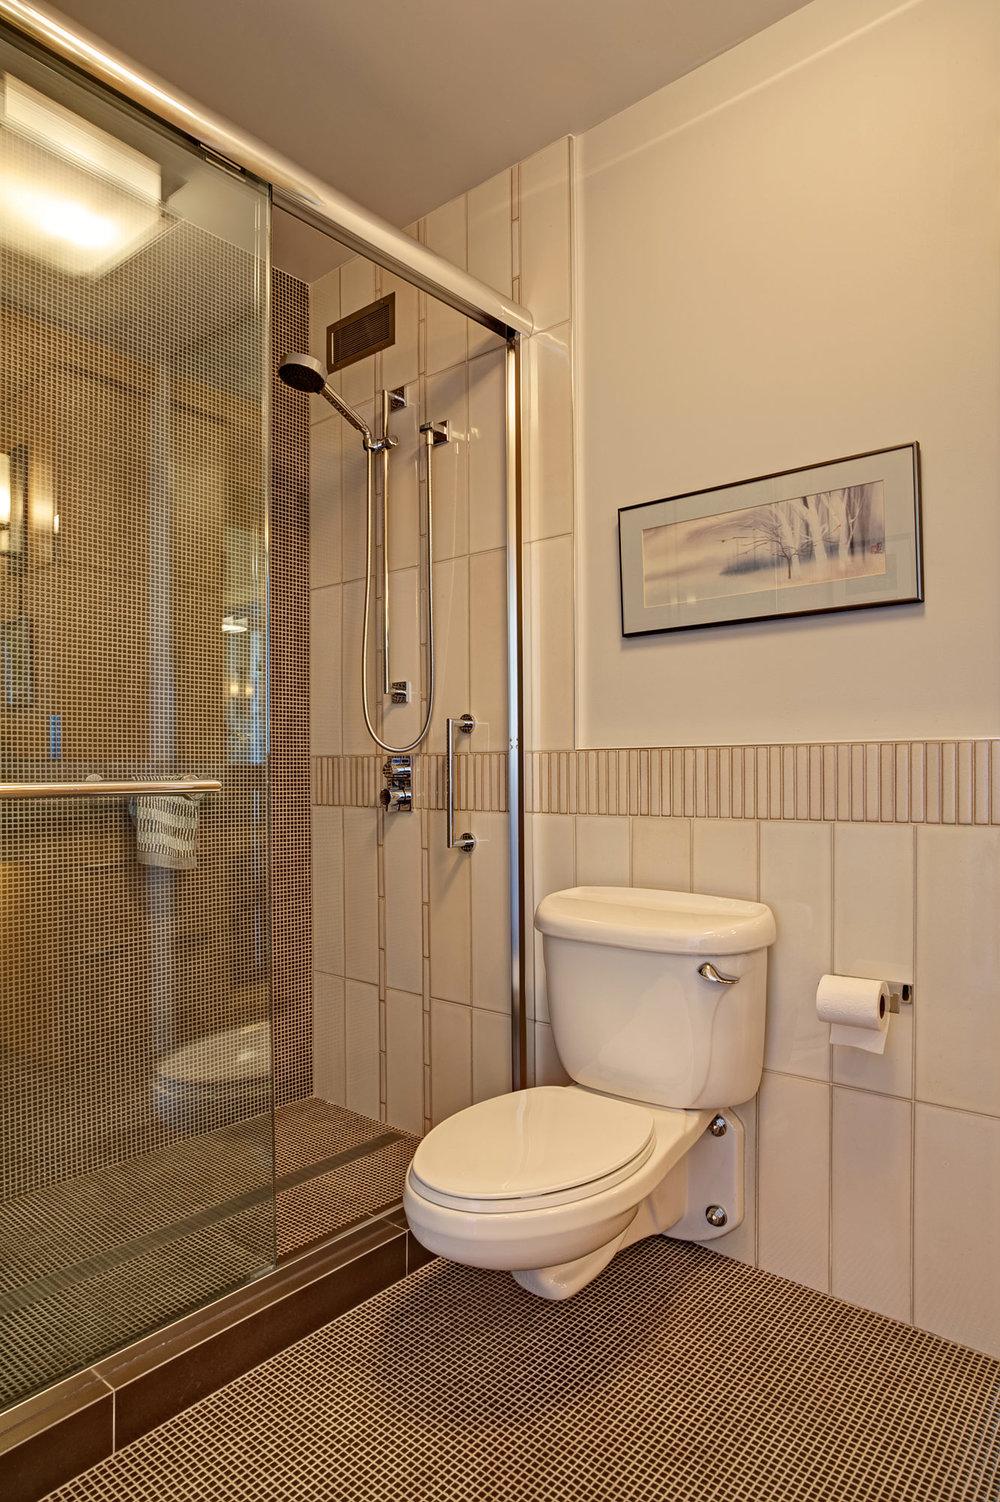 Kaplan-Architects-high-rise-interior-guest-bathroom-toilet-shower.jpg